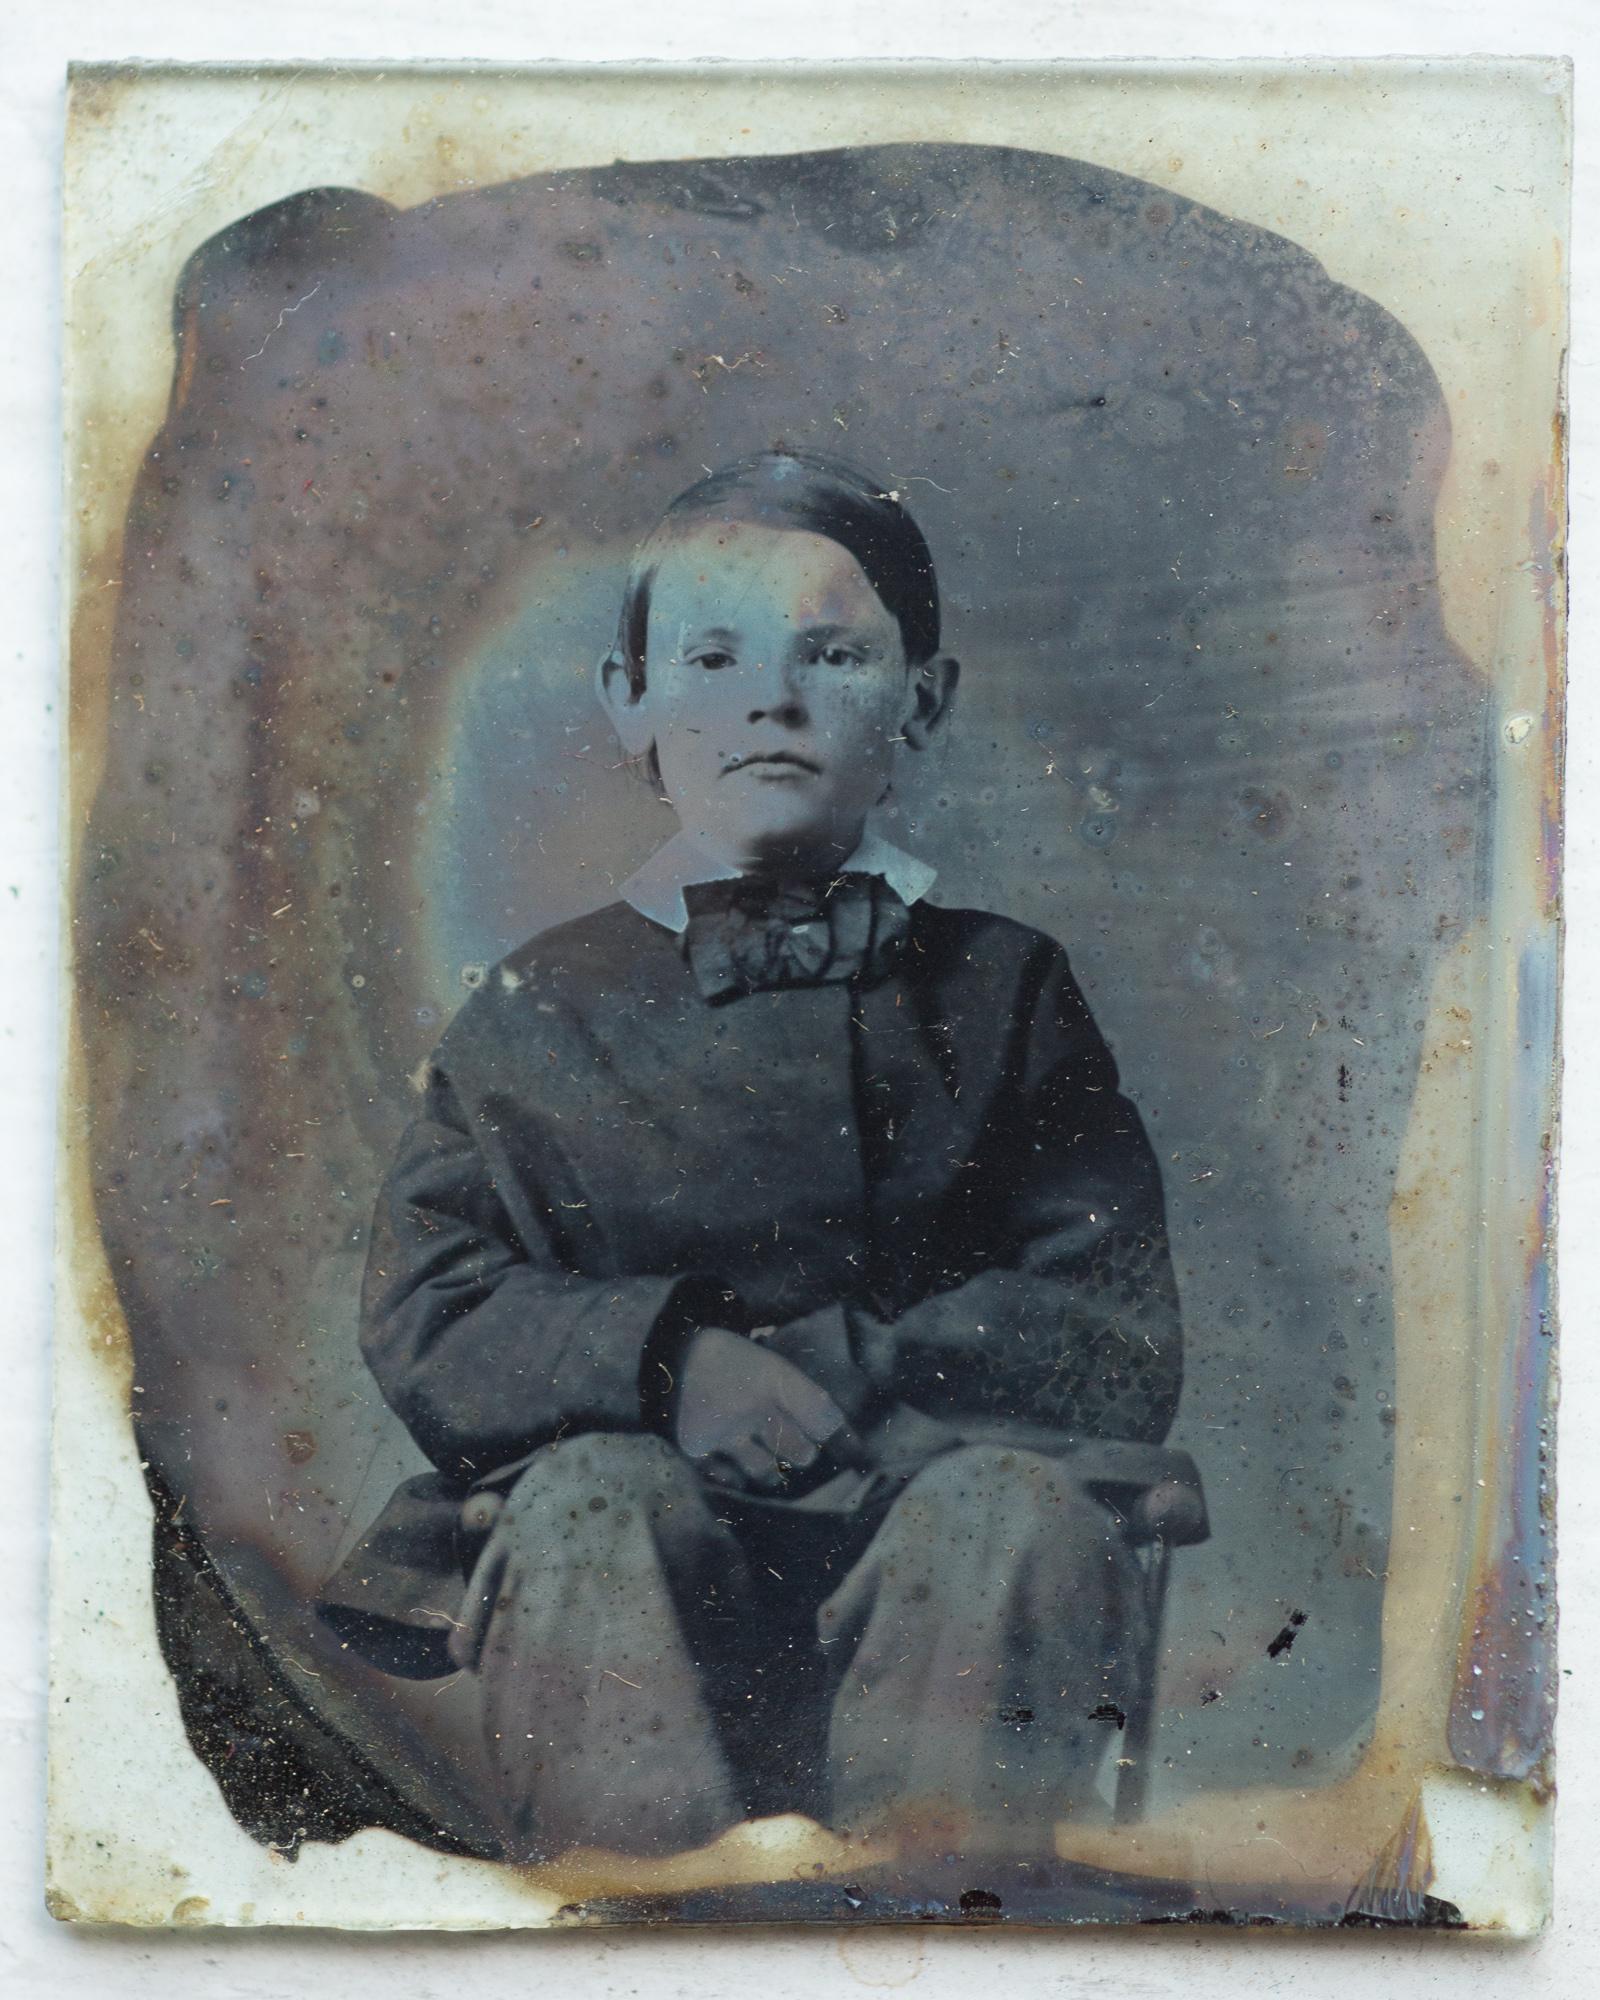 Ambrotype of young boy